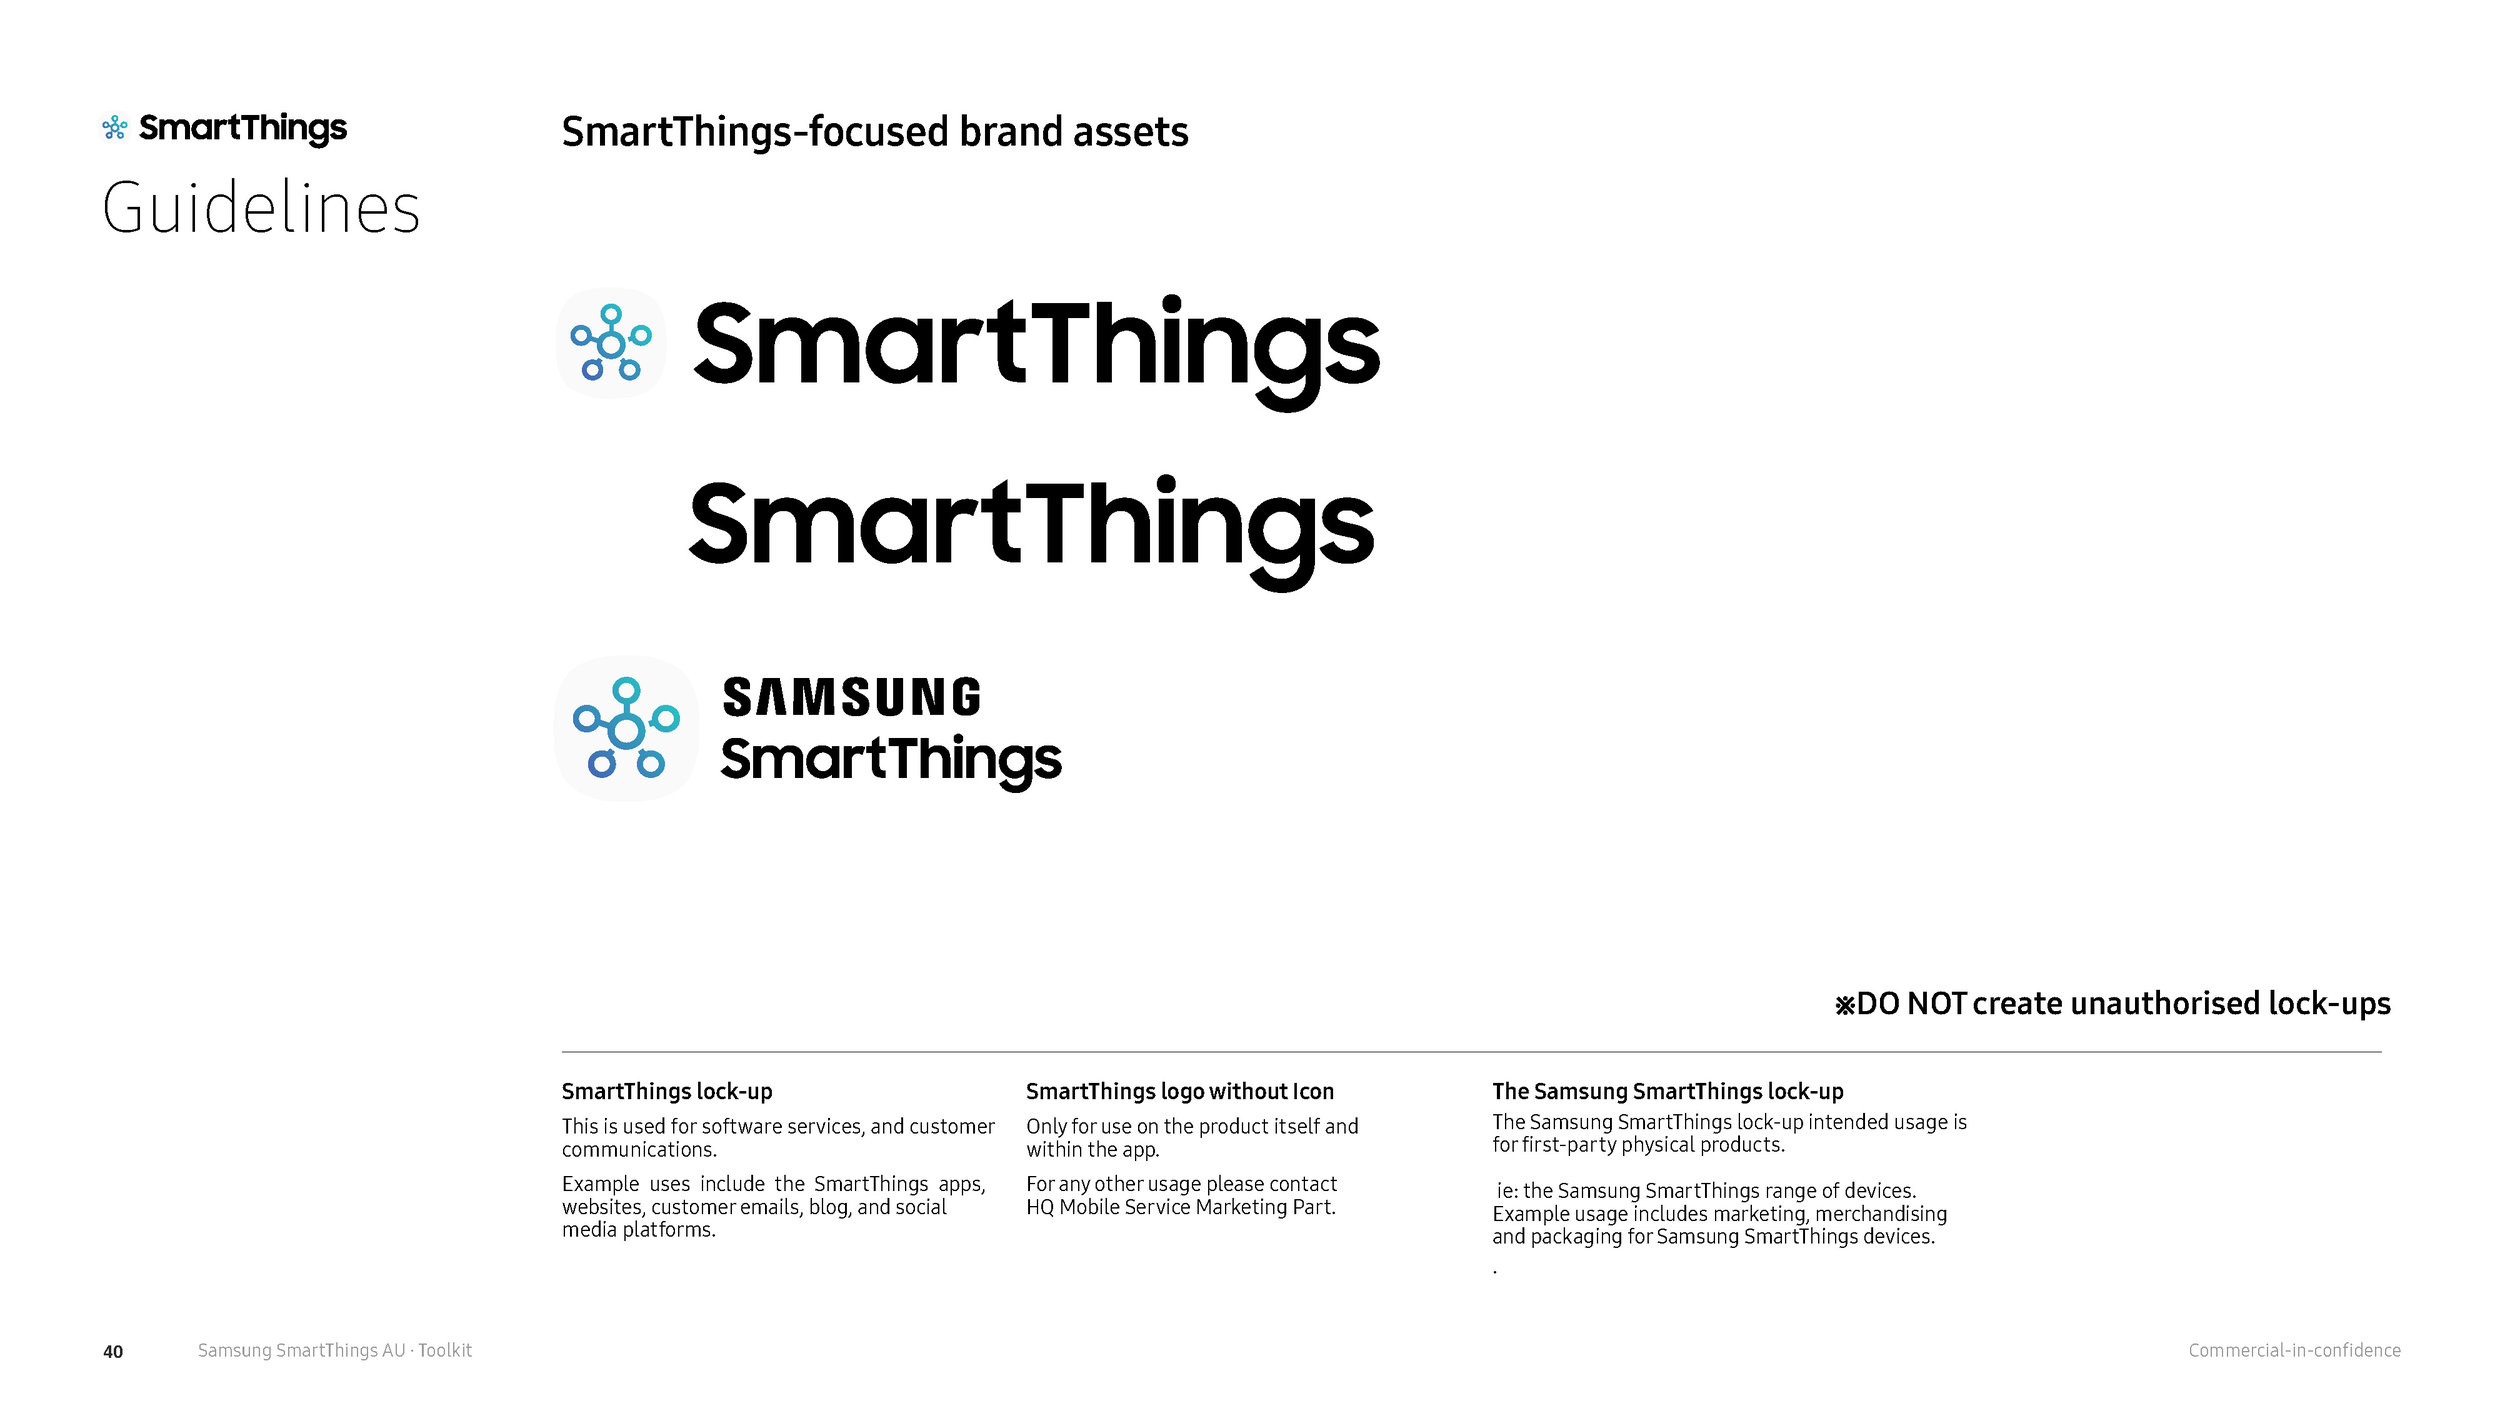 003639 Samsung SmartThings Toolkit 6_Page_40.jpg